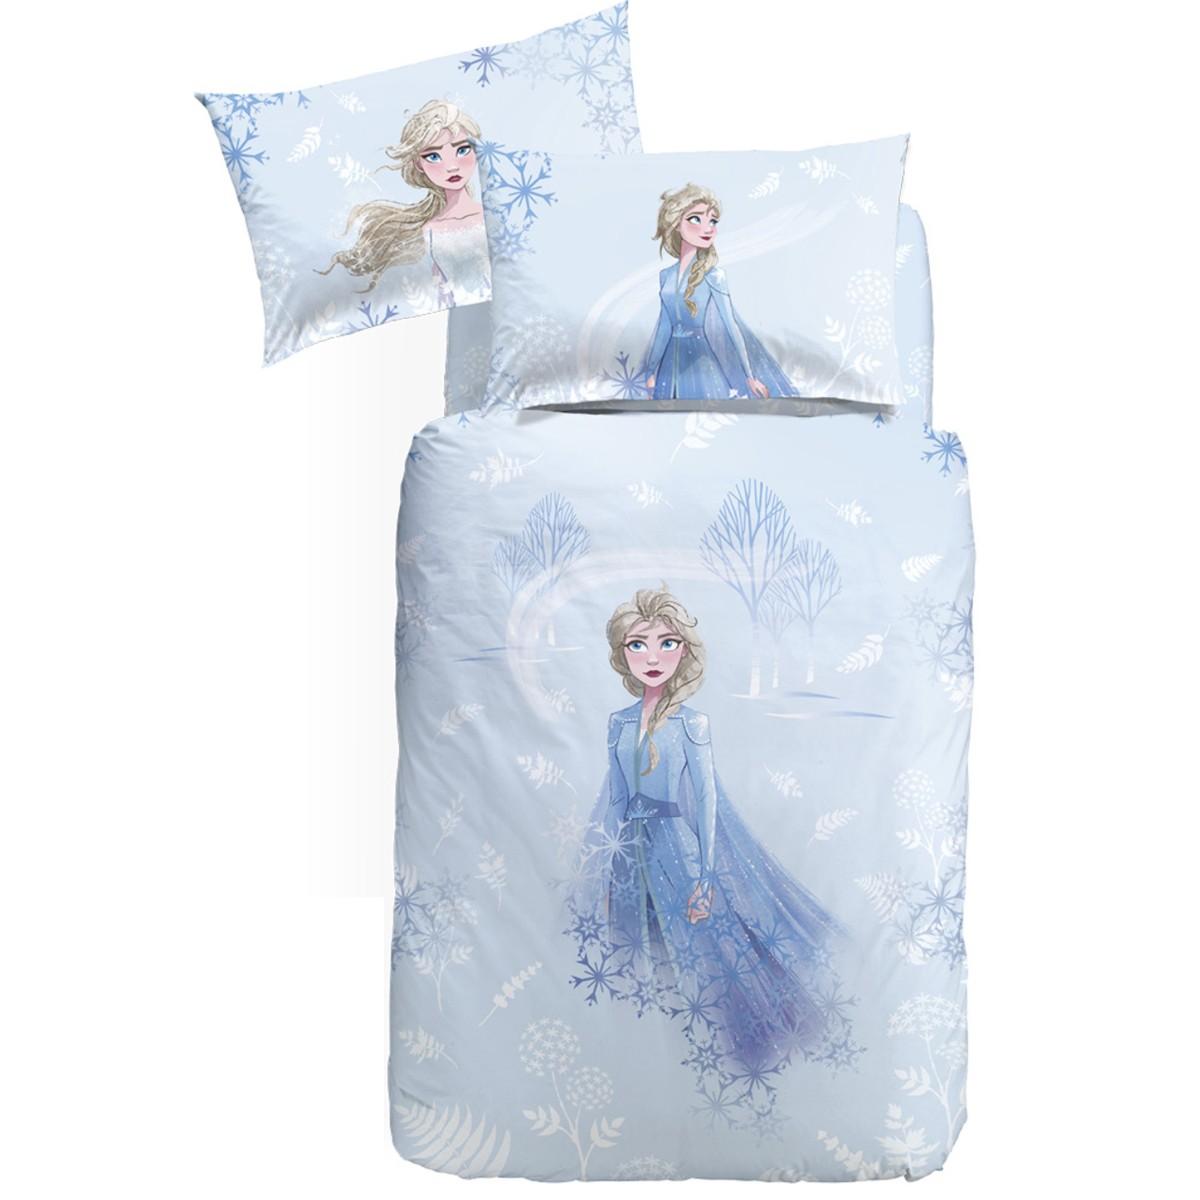 Copripiumino Frozen Disney.Copripiumino Frozen Disney Caleffi Singolo Elsa Casadasogno